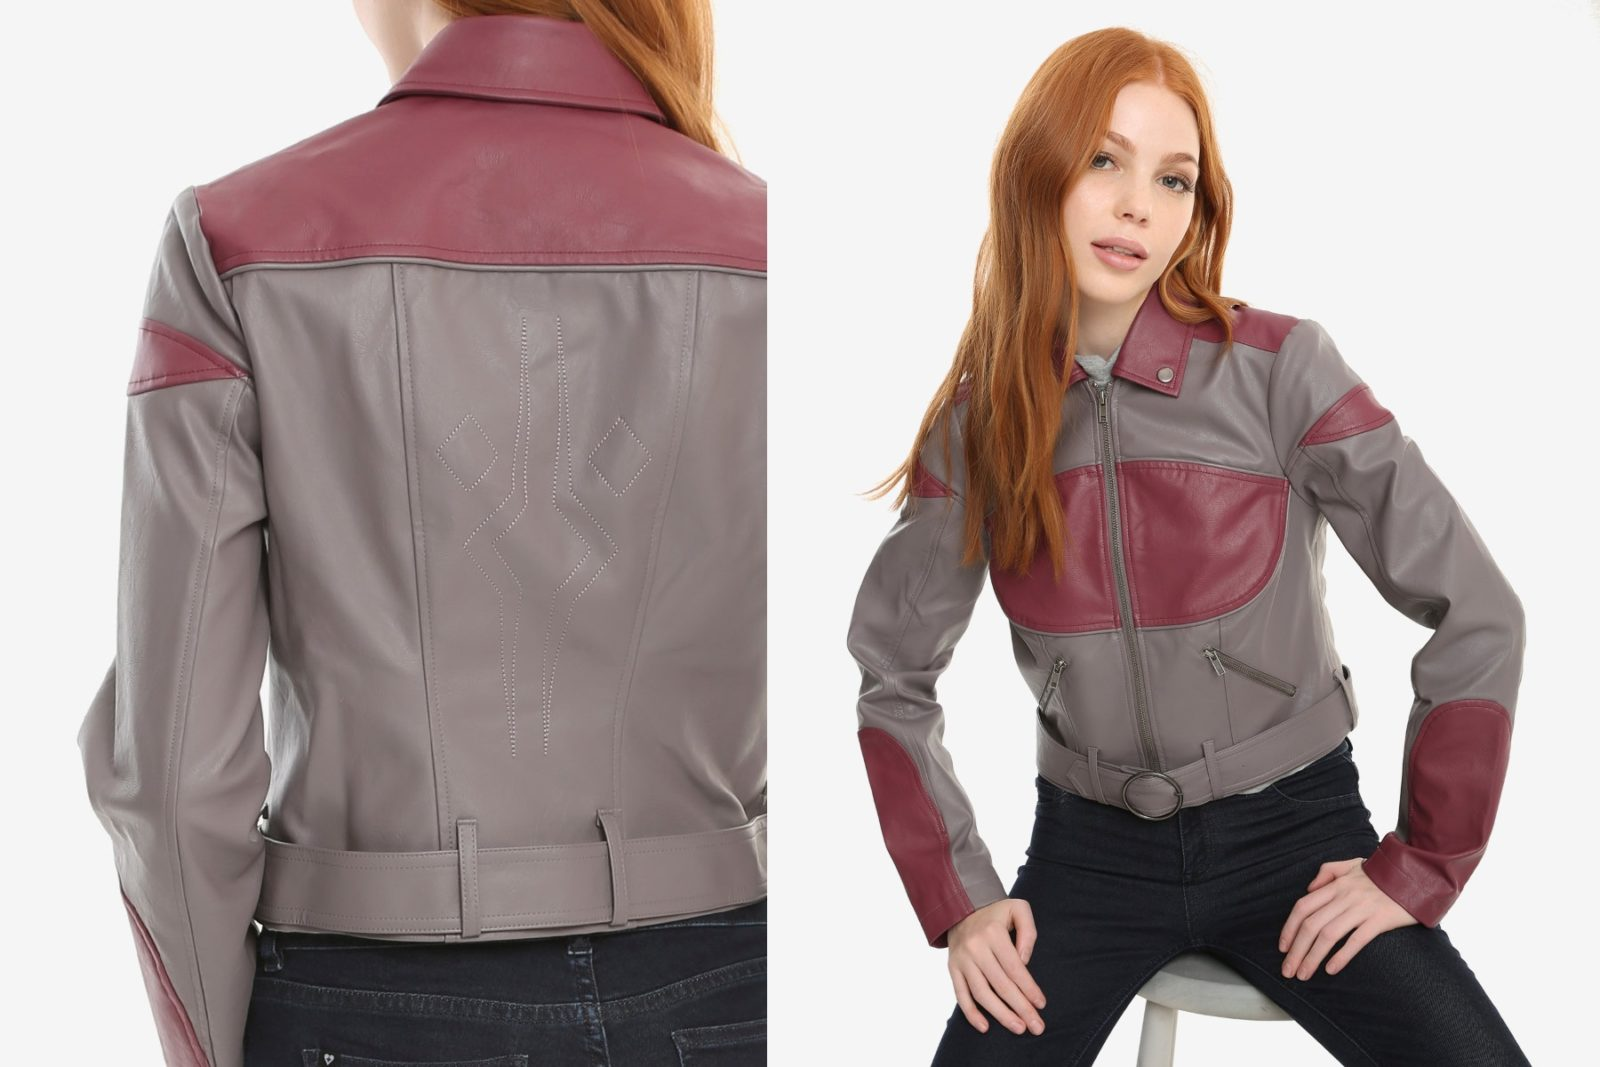 Her Universe Ahsoka Tano Faux Leather Jacket